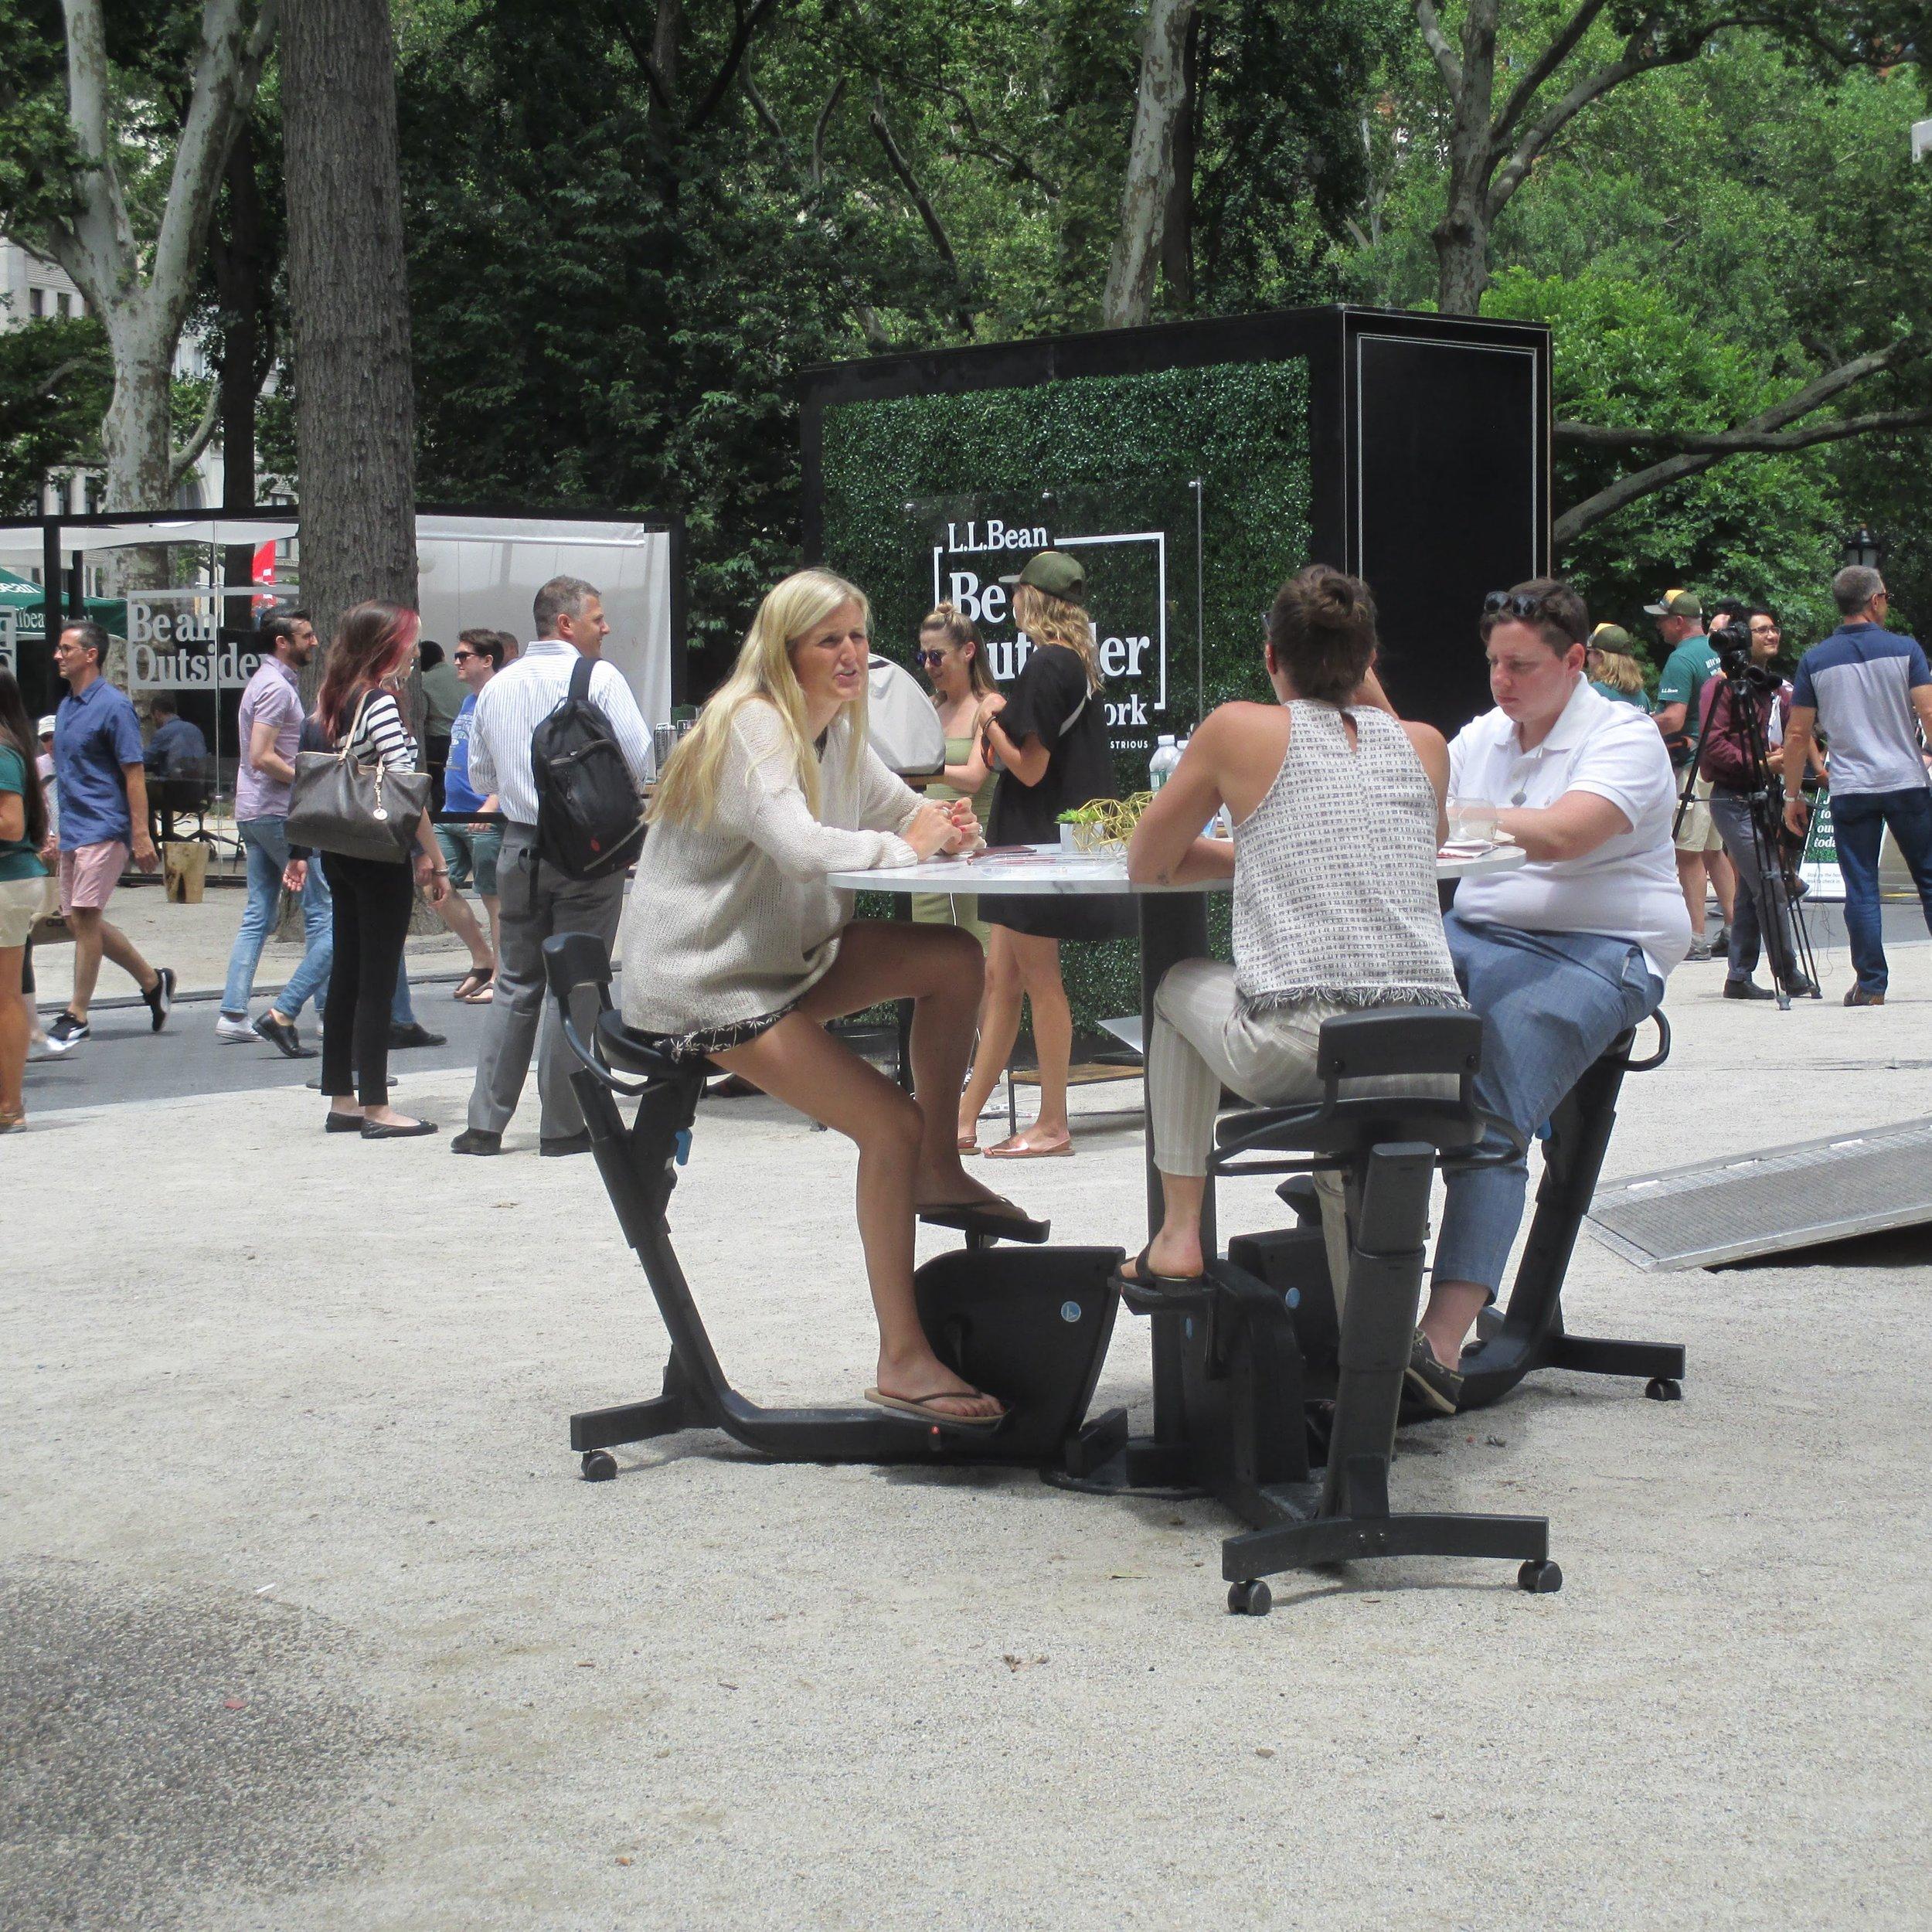 cycling-desk-working-outdoors.jpeg